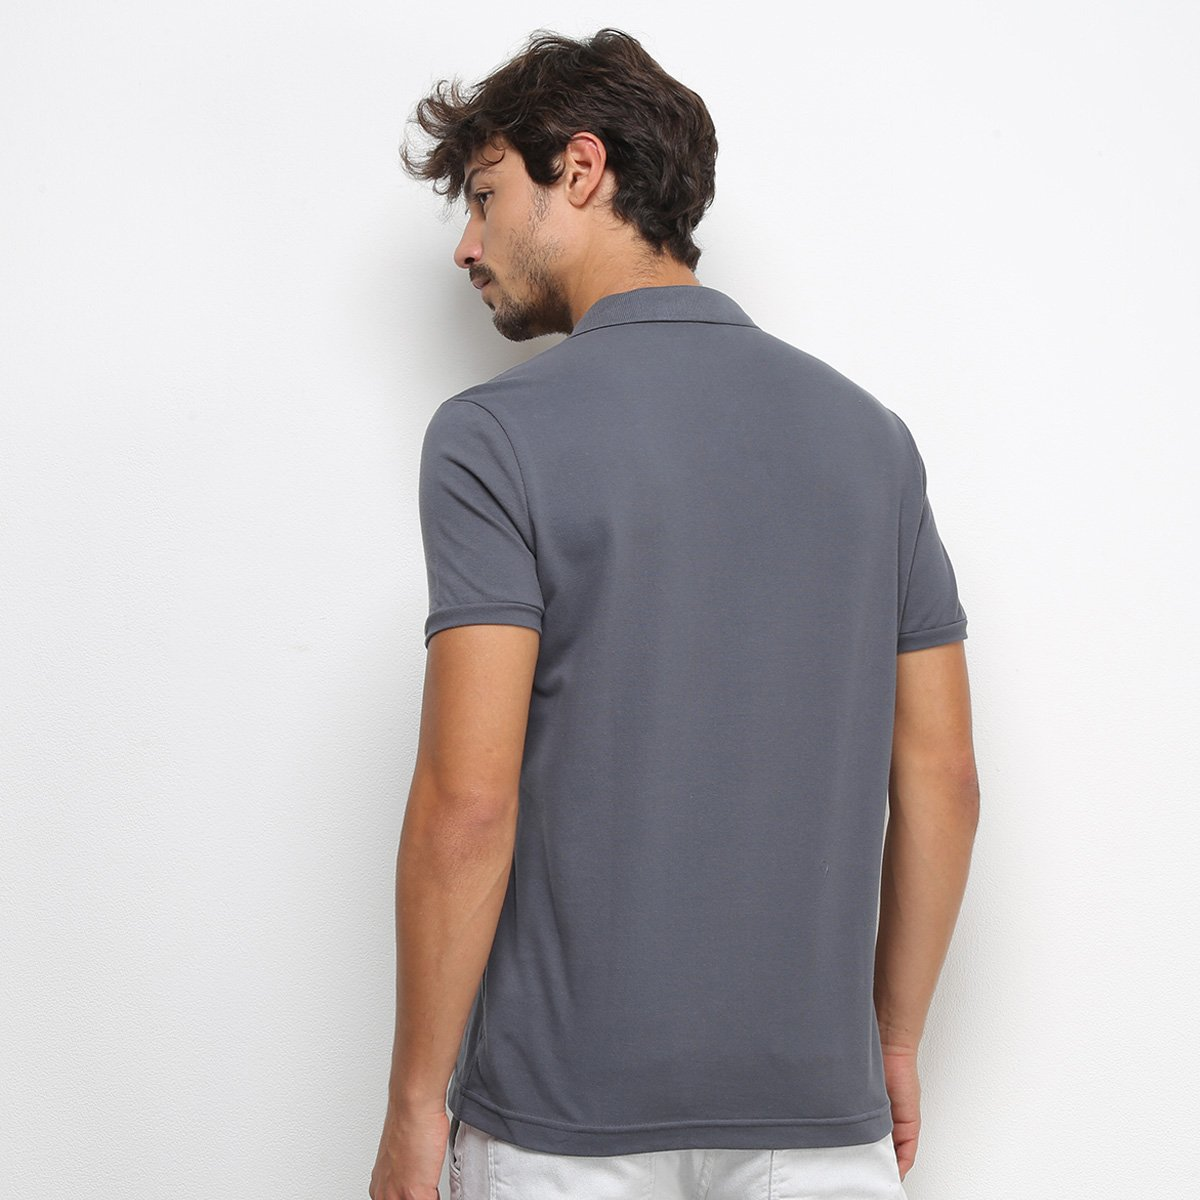 Camisa Polo Acostamento Masculina - Tam: GG - 1